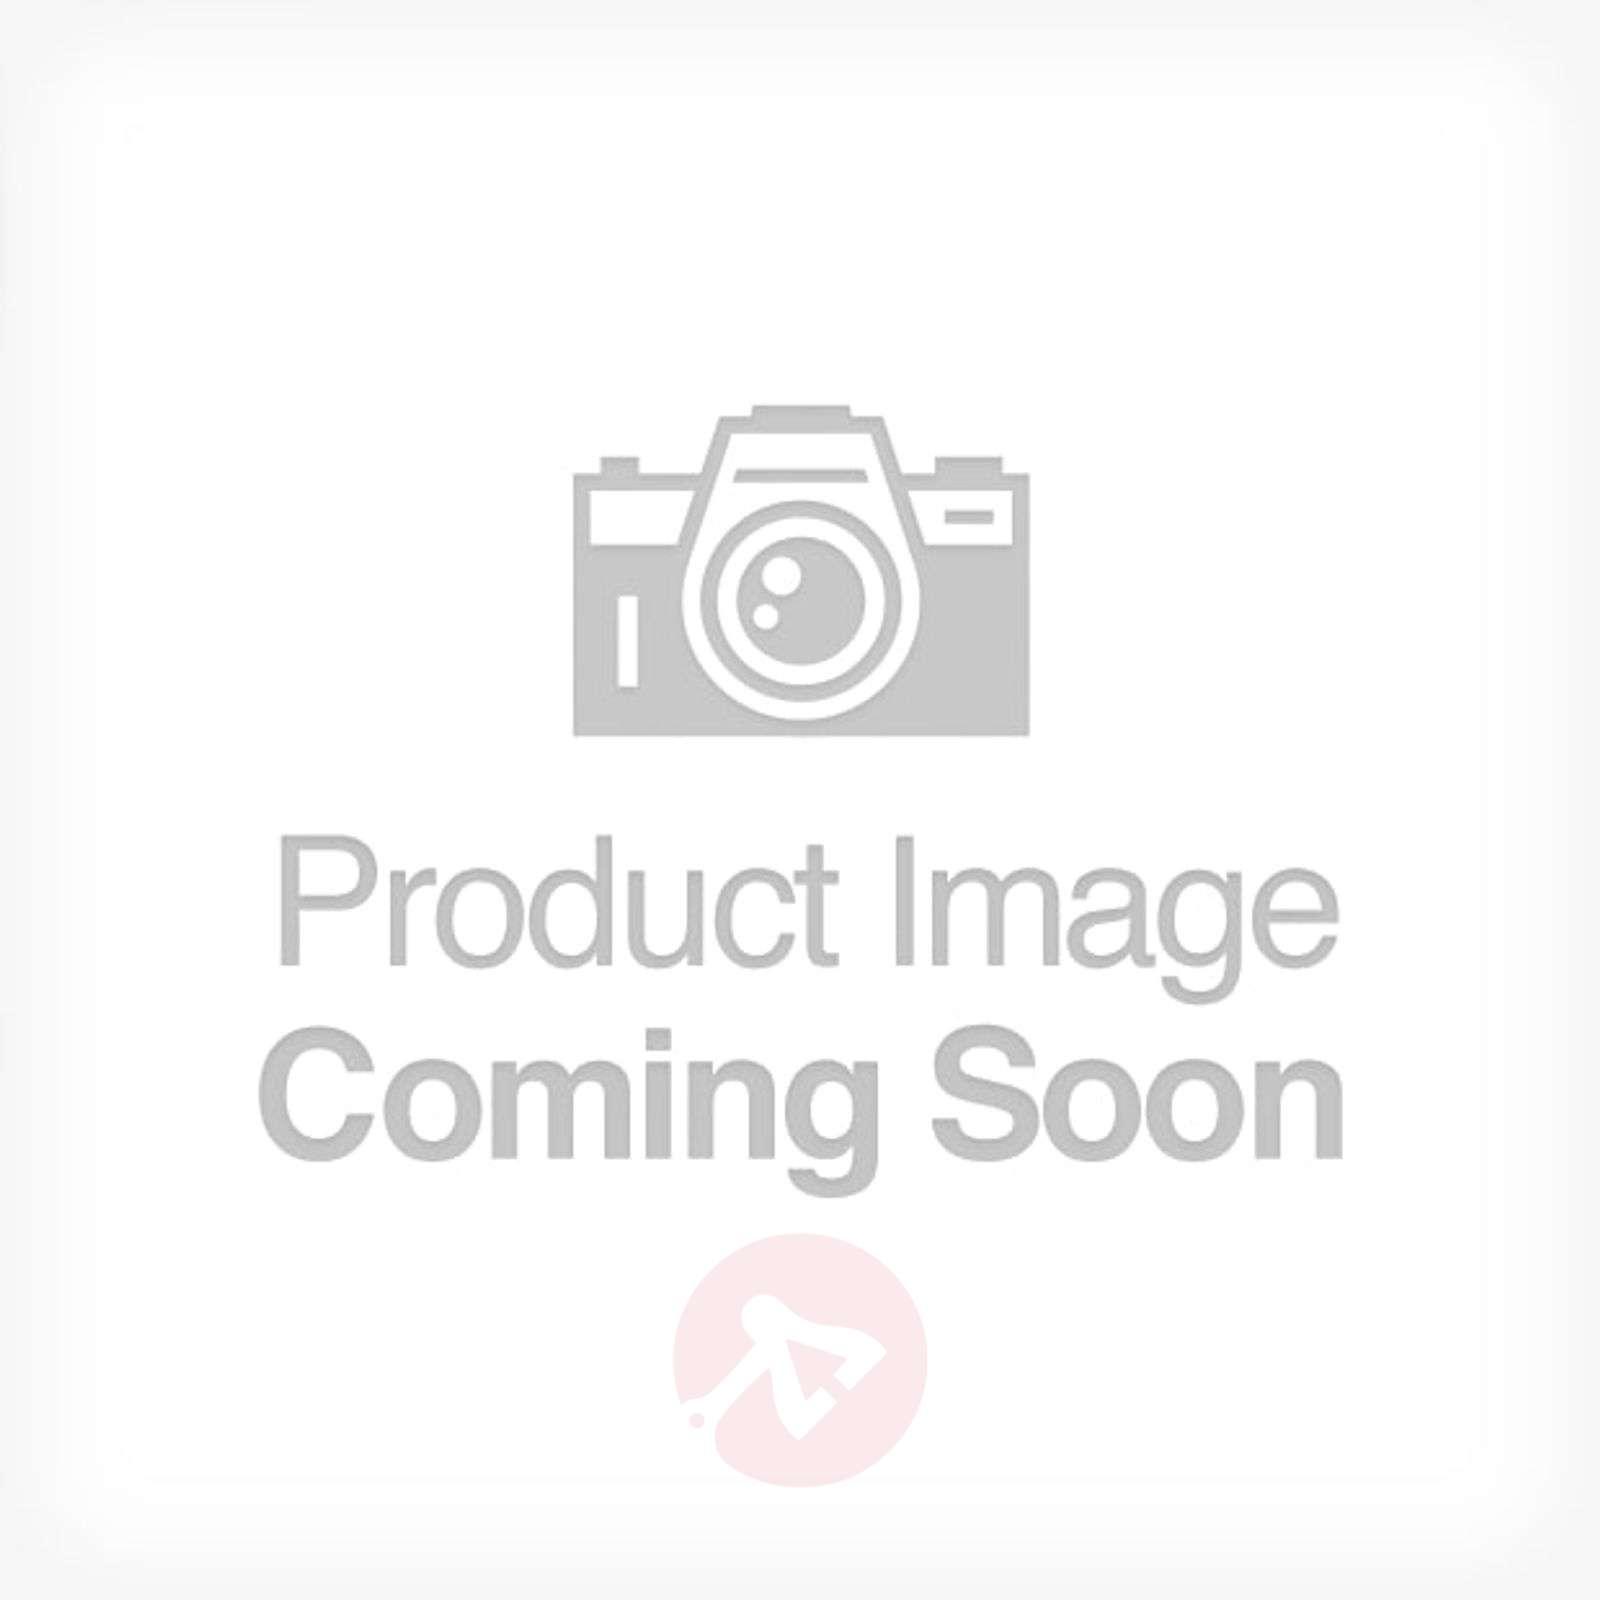 Square recessed light Downlight-1009038X-01